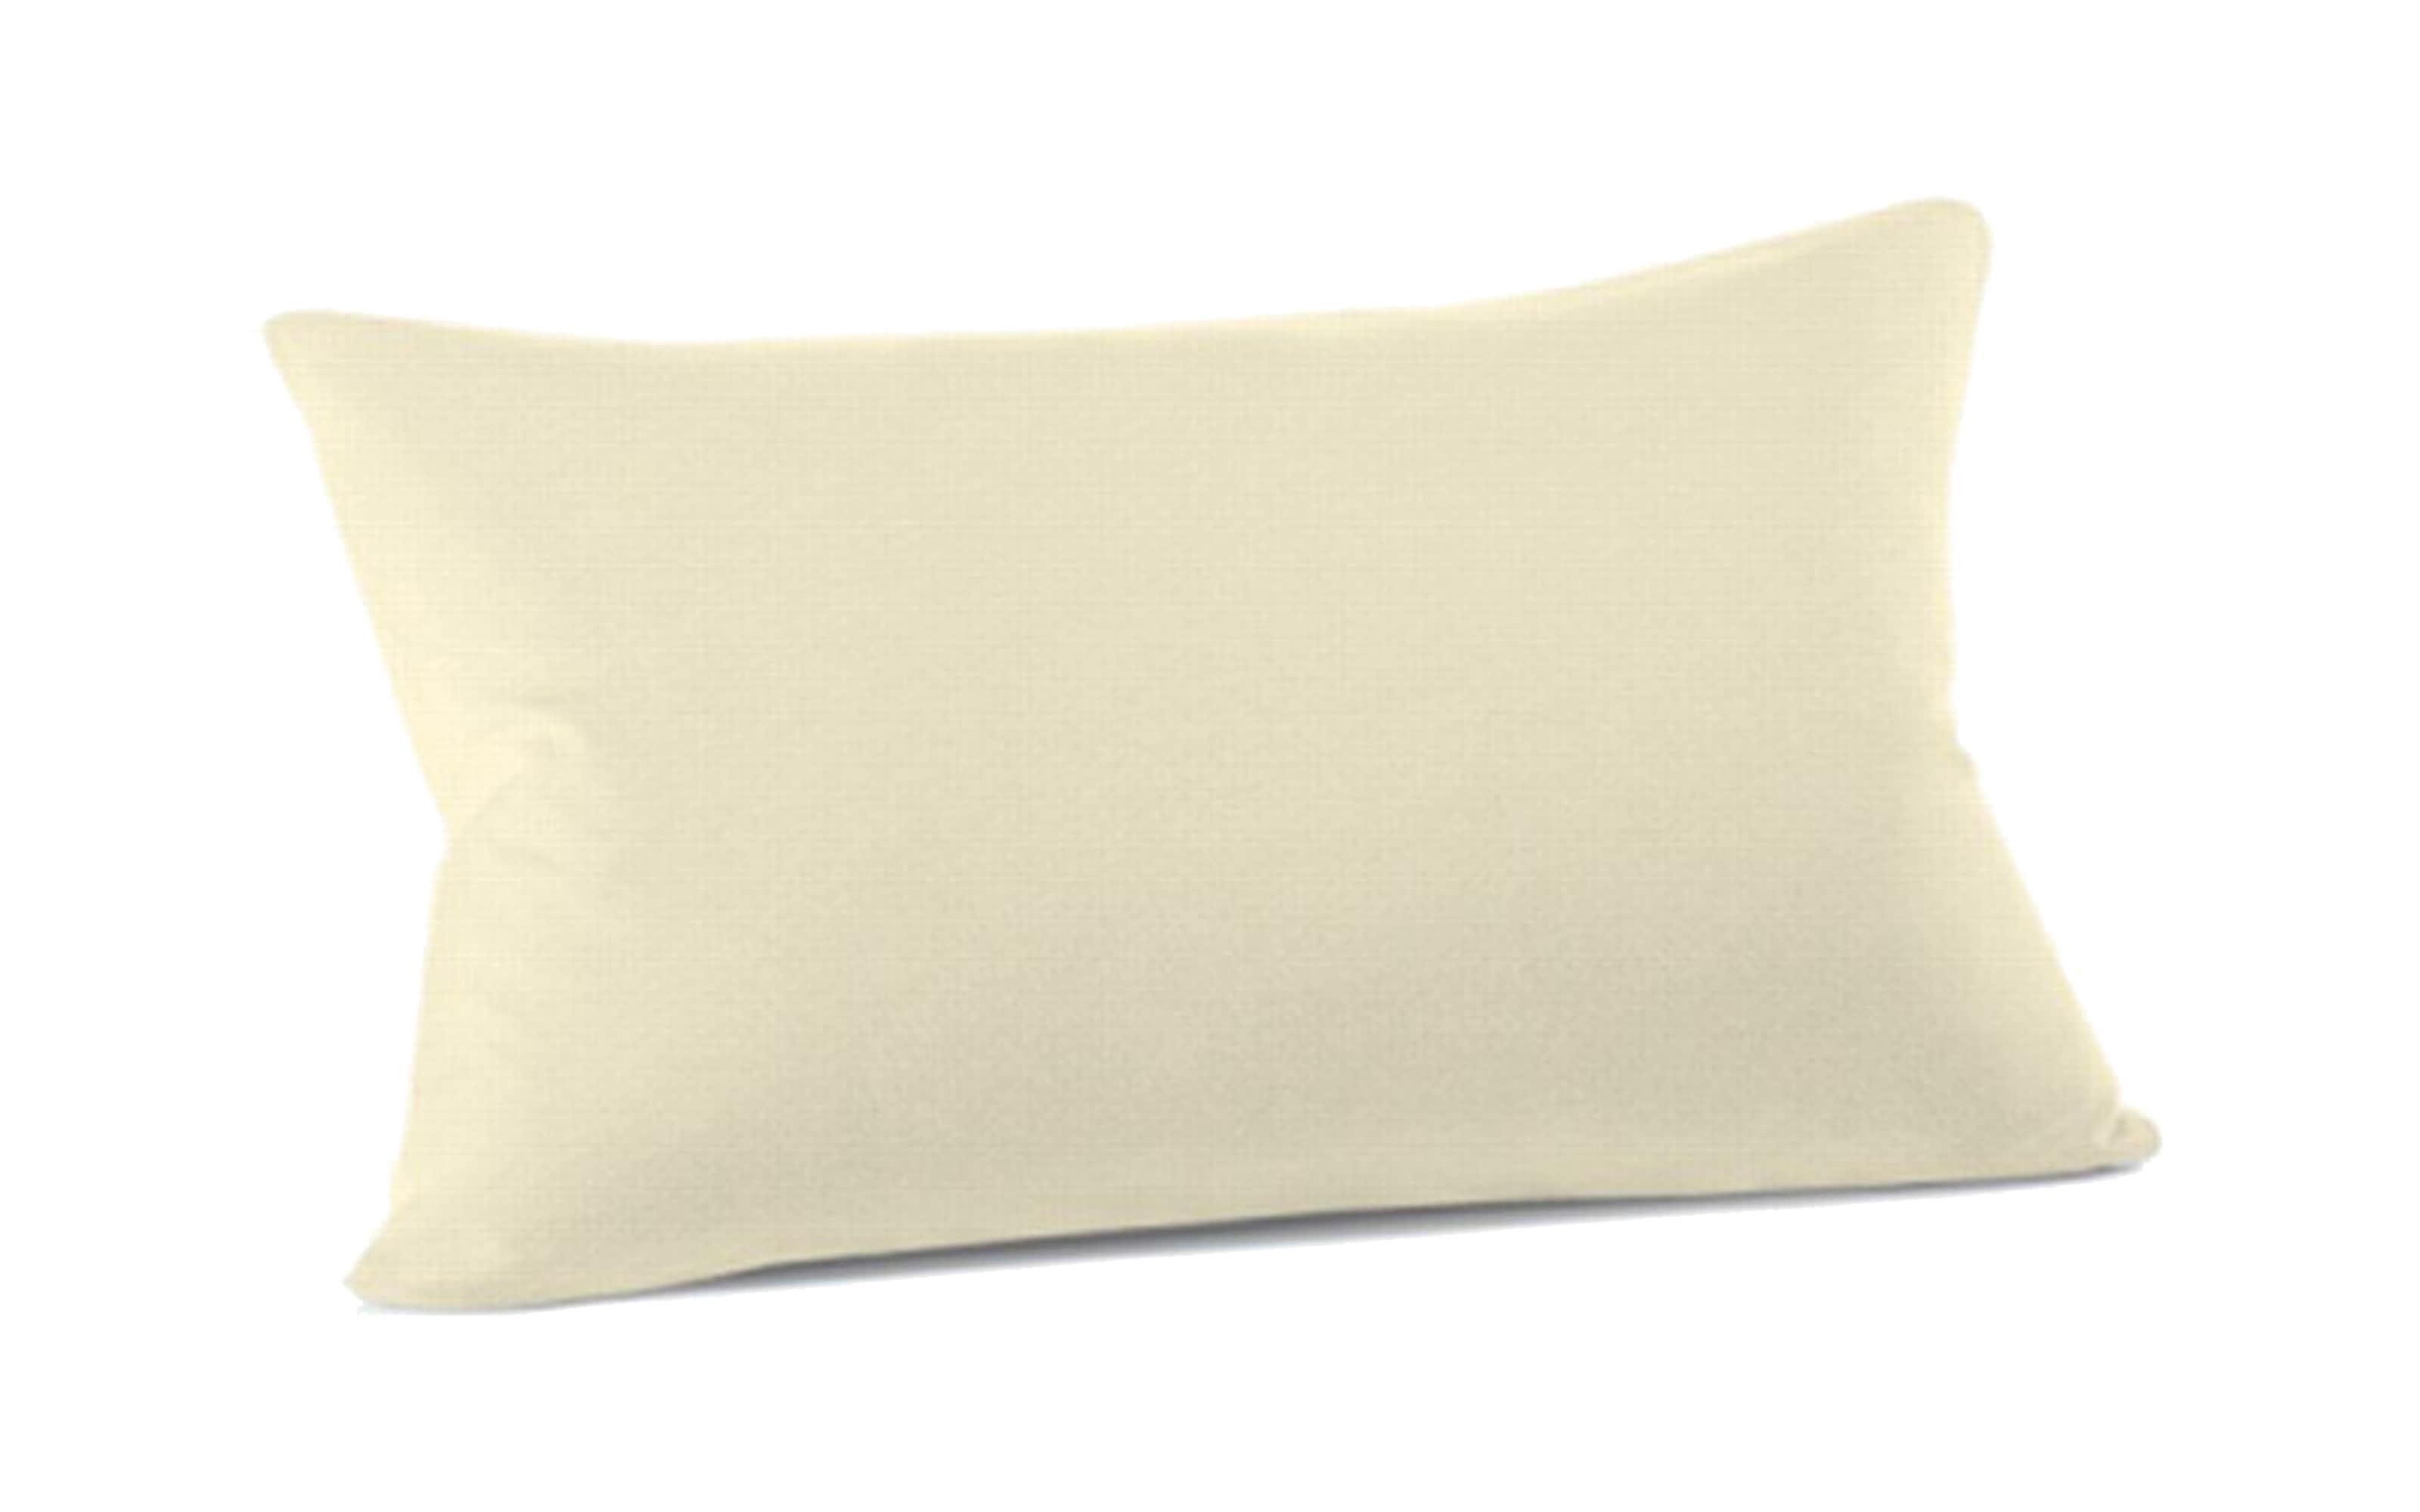 Kissenbezug Mako Jersey in ecru, 40 x 60 cm